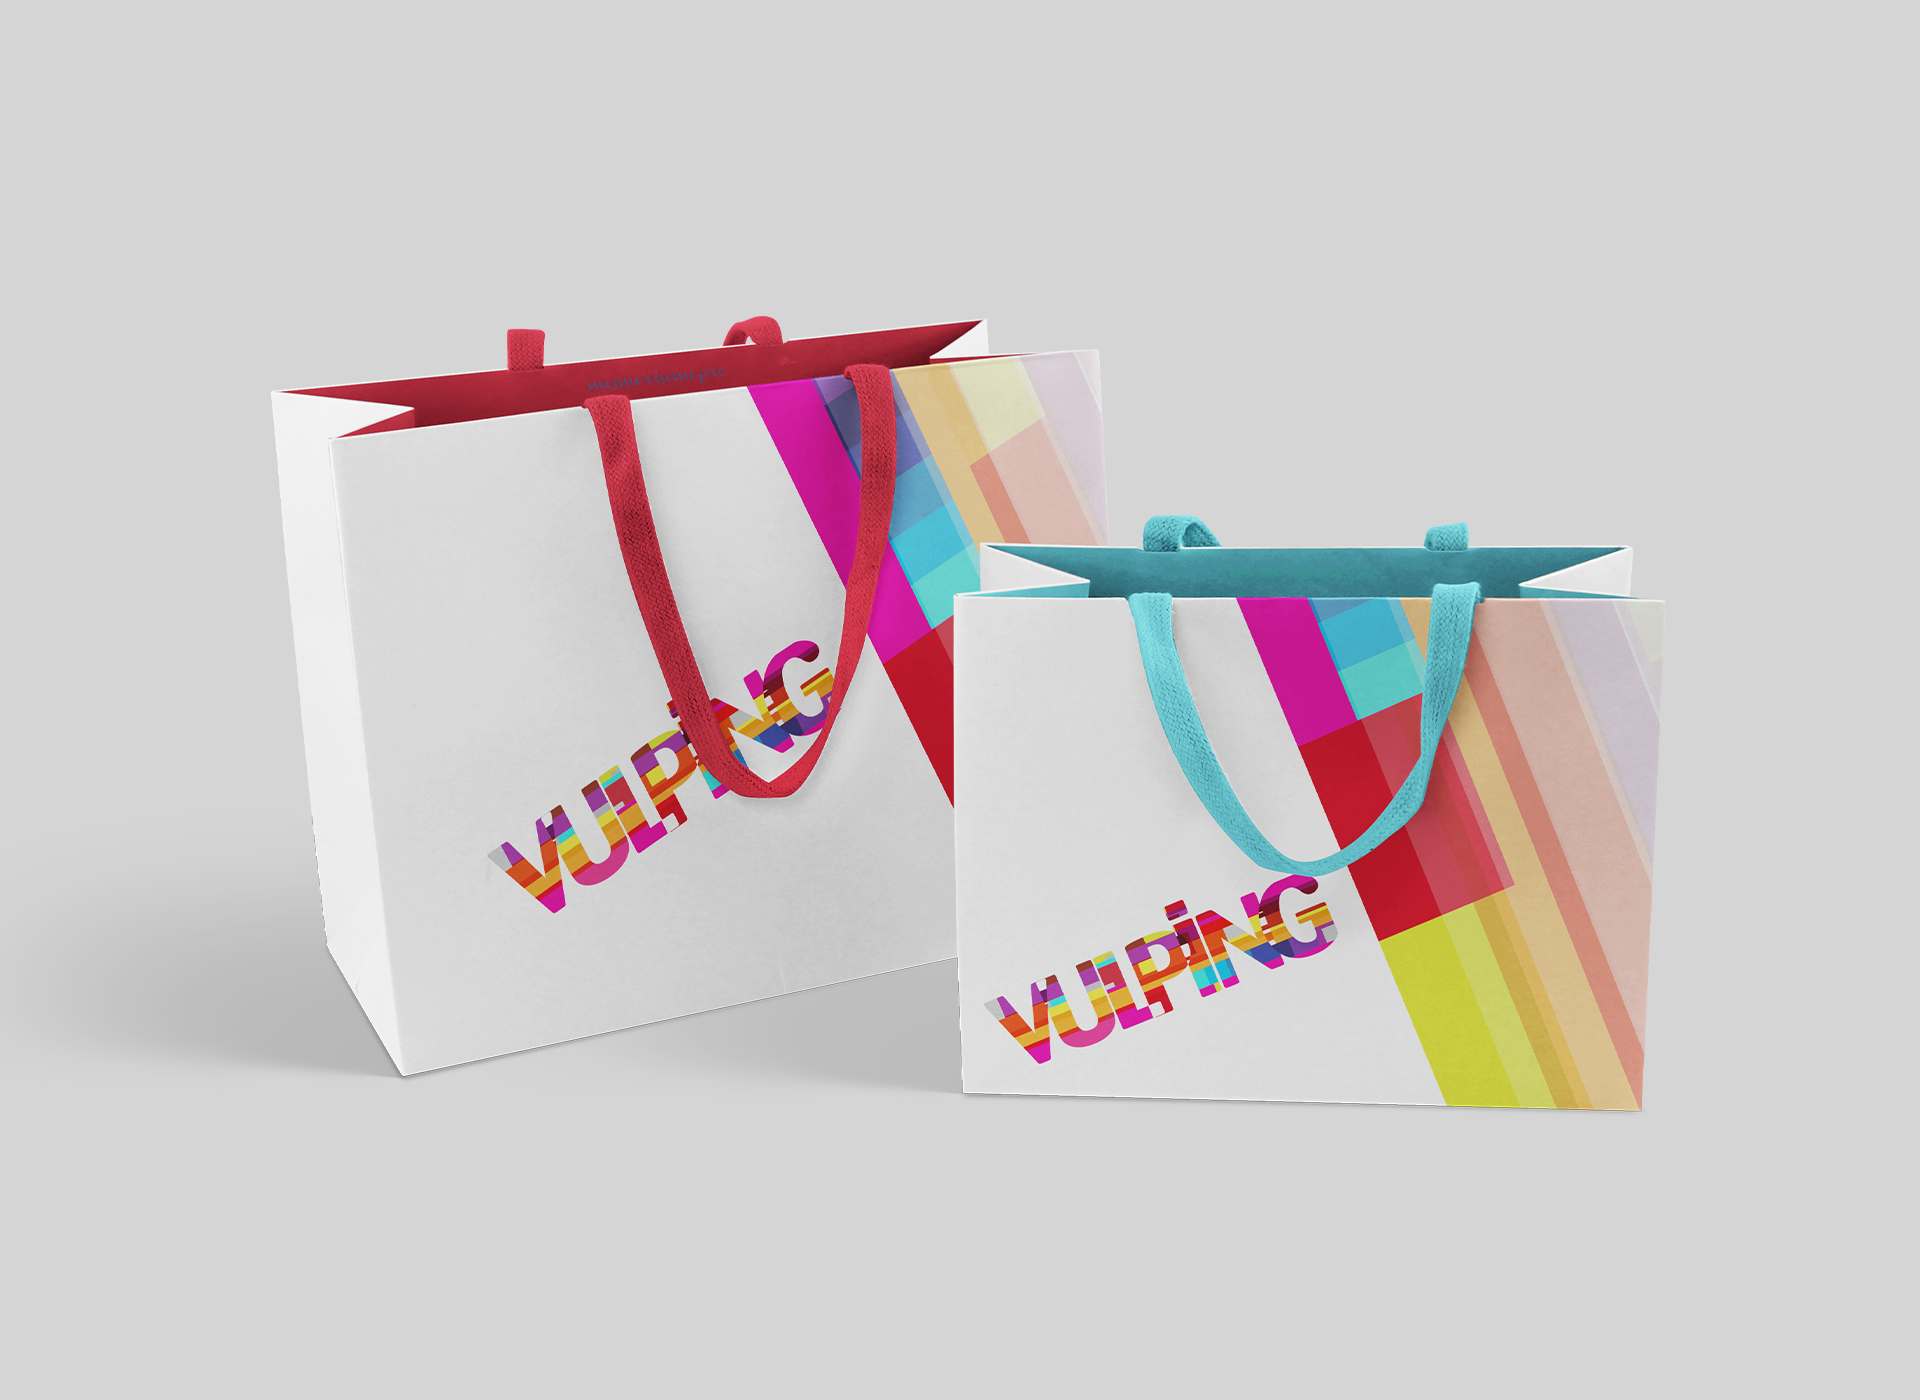 vulping branding by inoveo bag